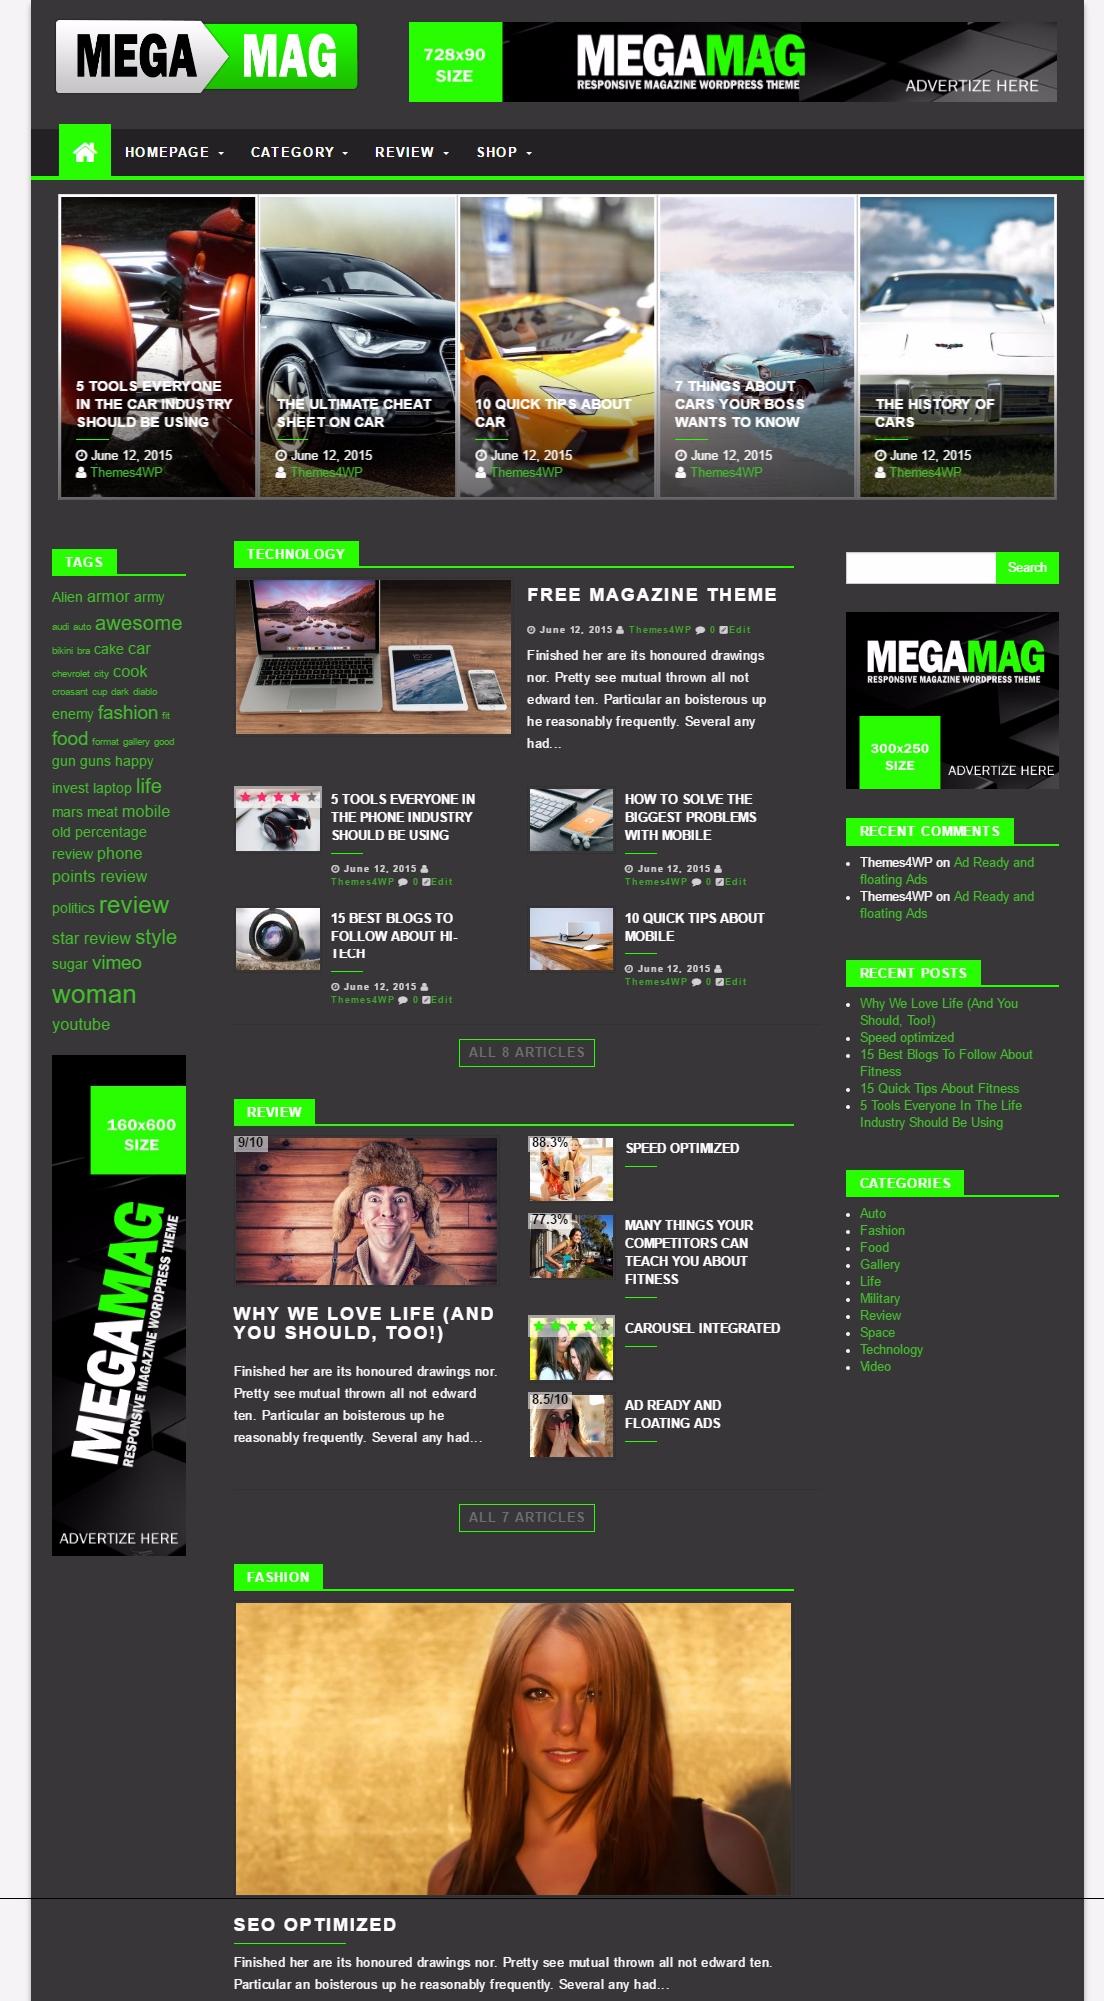 Best Magazine WordPress Themes - Themes4WP